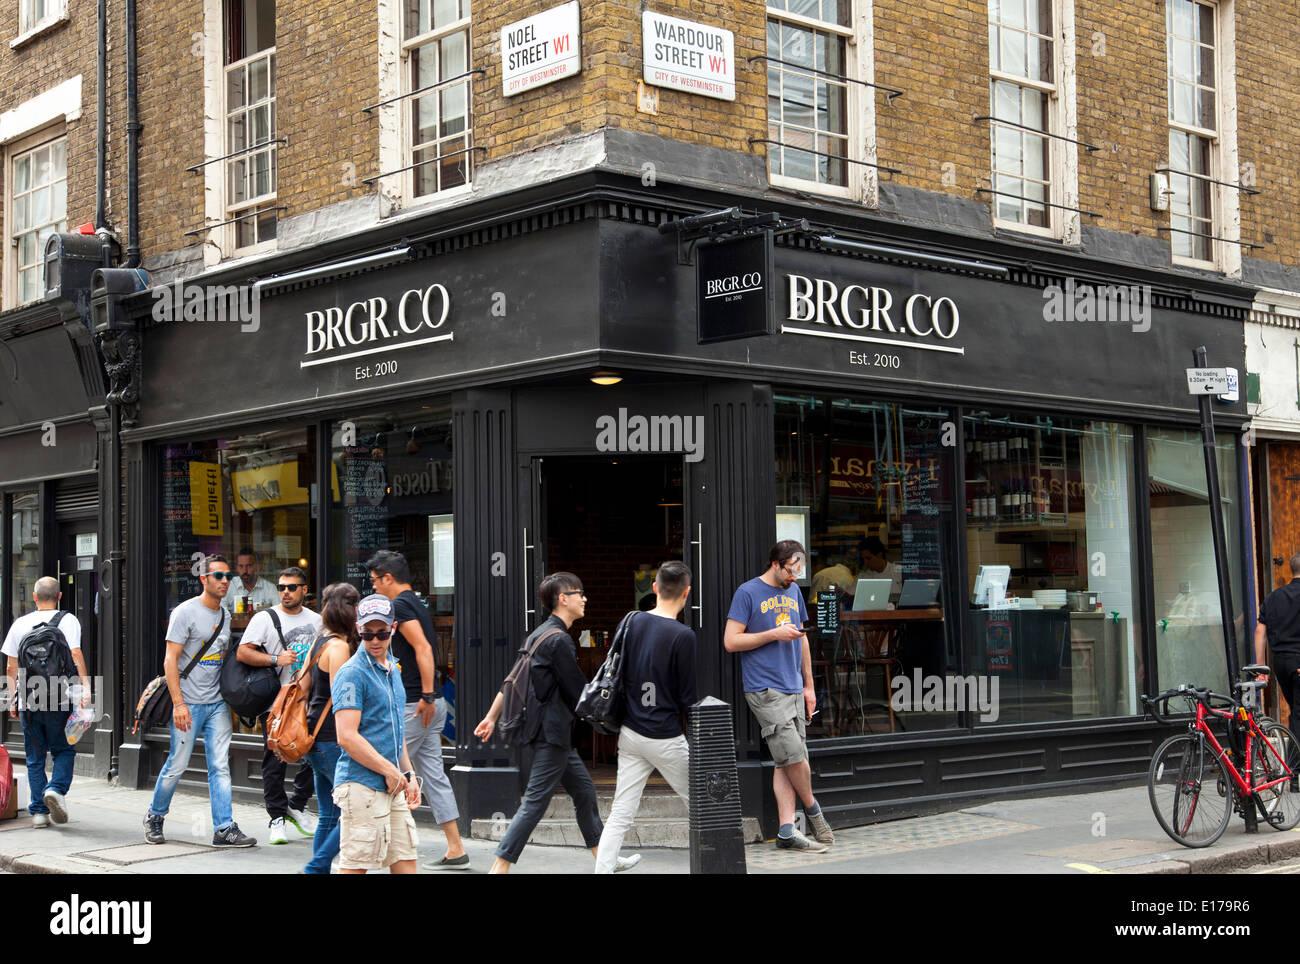 BRGR Co restaurant, Wardour Street, Soho, London, England, U.K. - Stock Image